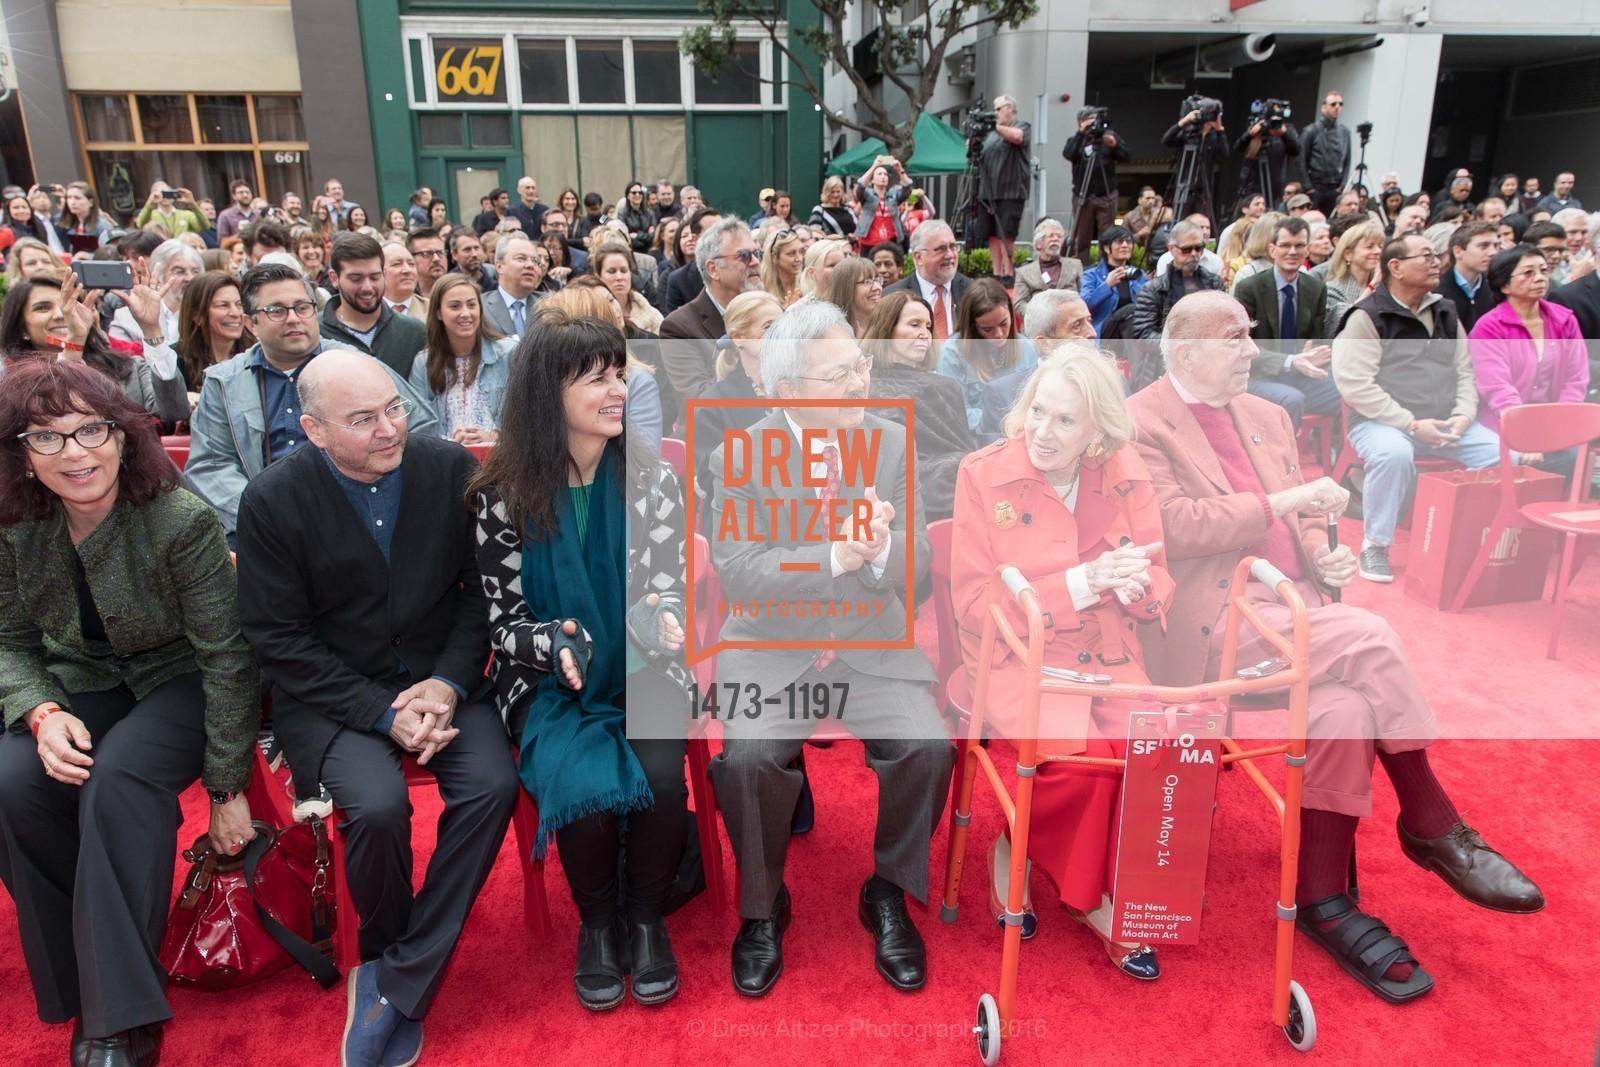 Craig Dykers, Elaine Molinar, Ed Lee, Charlotte Shultz, George Shultz, Photo #1473-1197